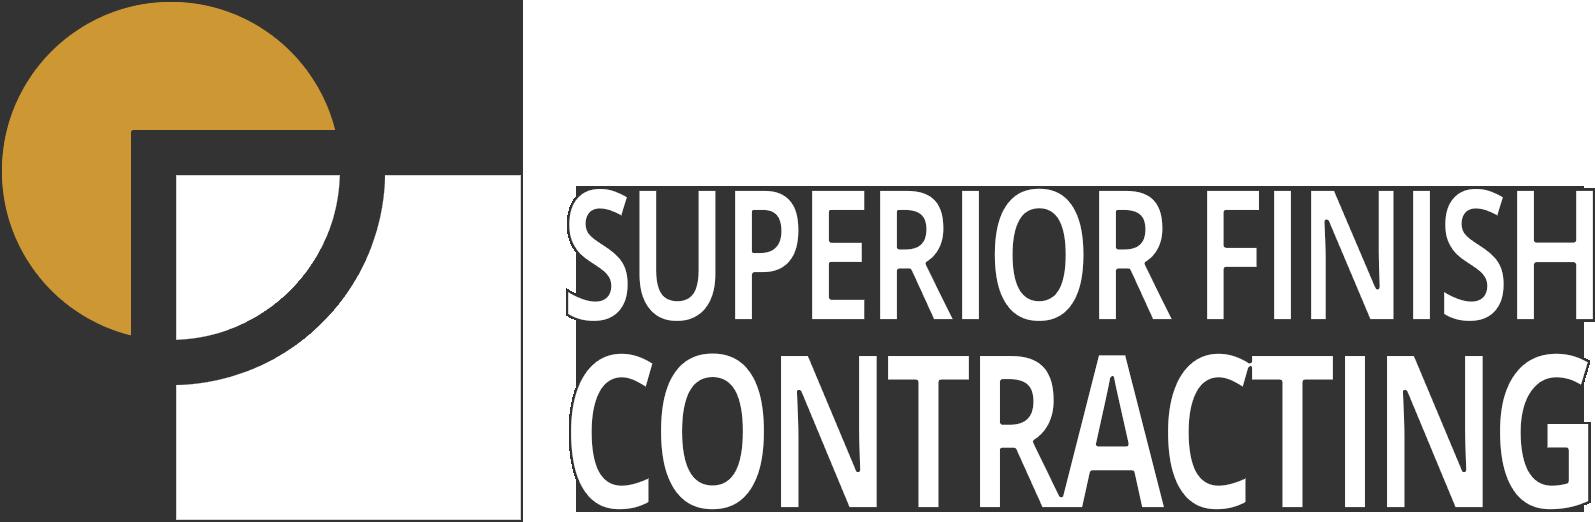 superior-finish-contracting-logo-4